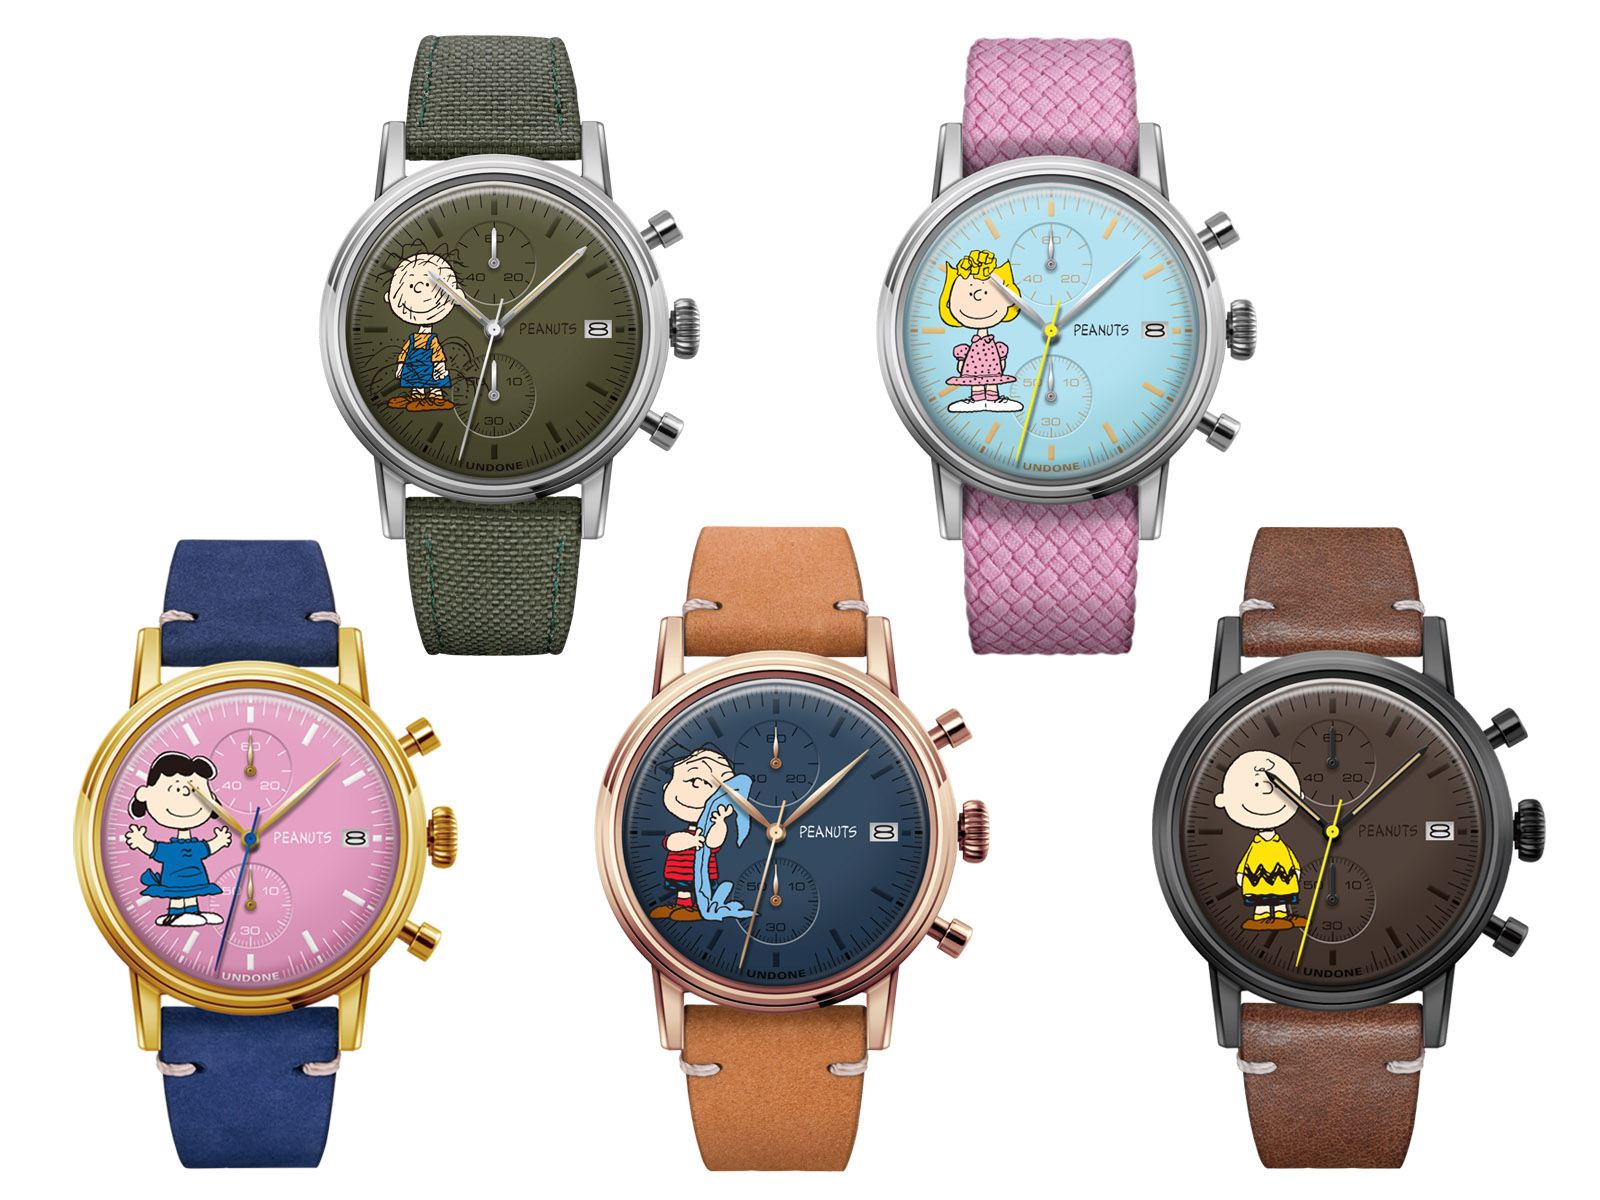 Undone Peanuts Urban One World Chronograph Custom examples